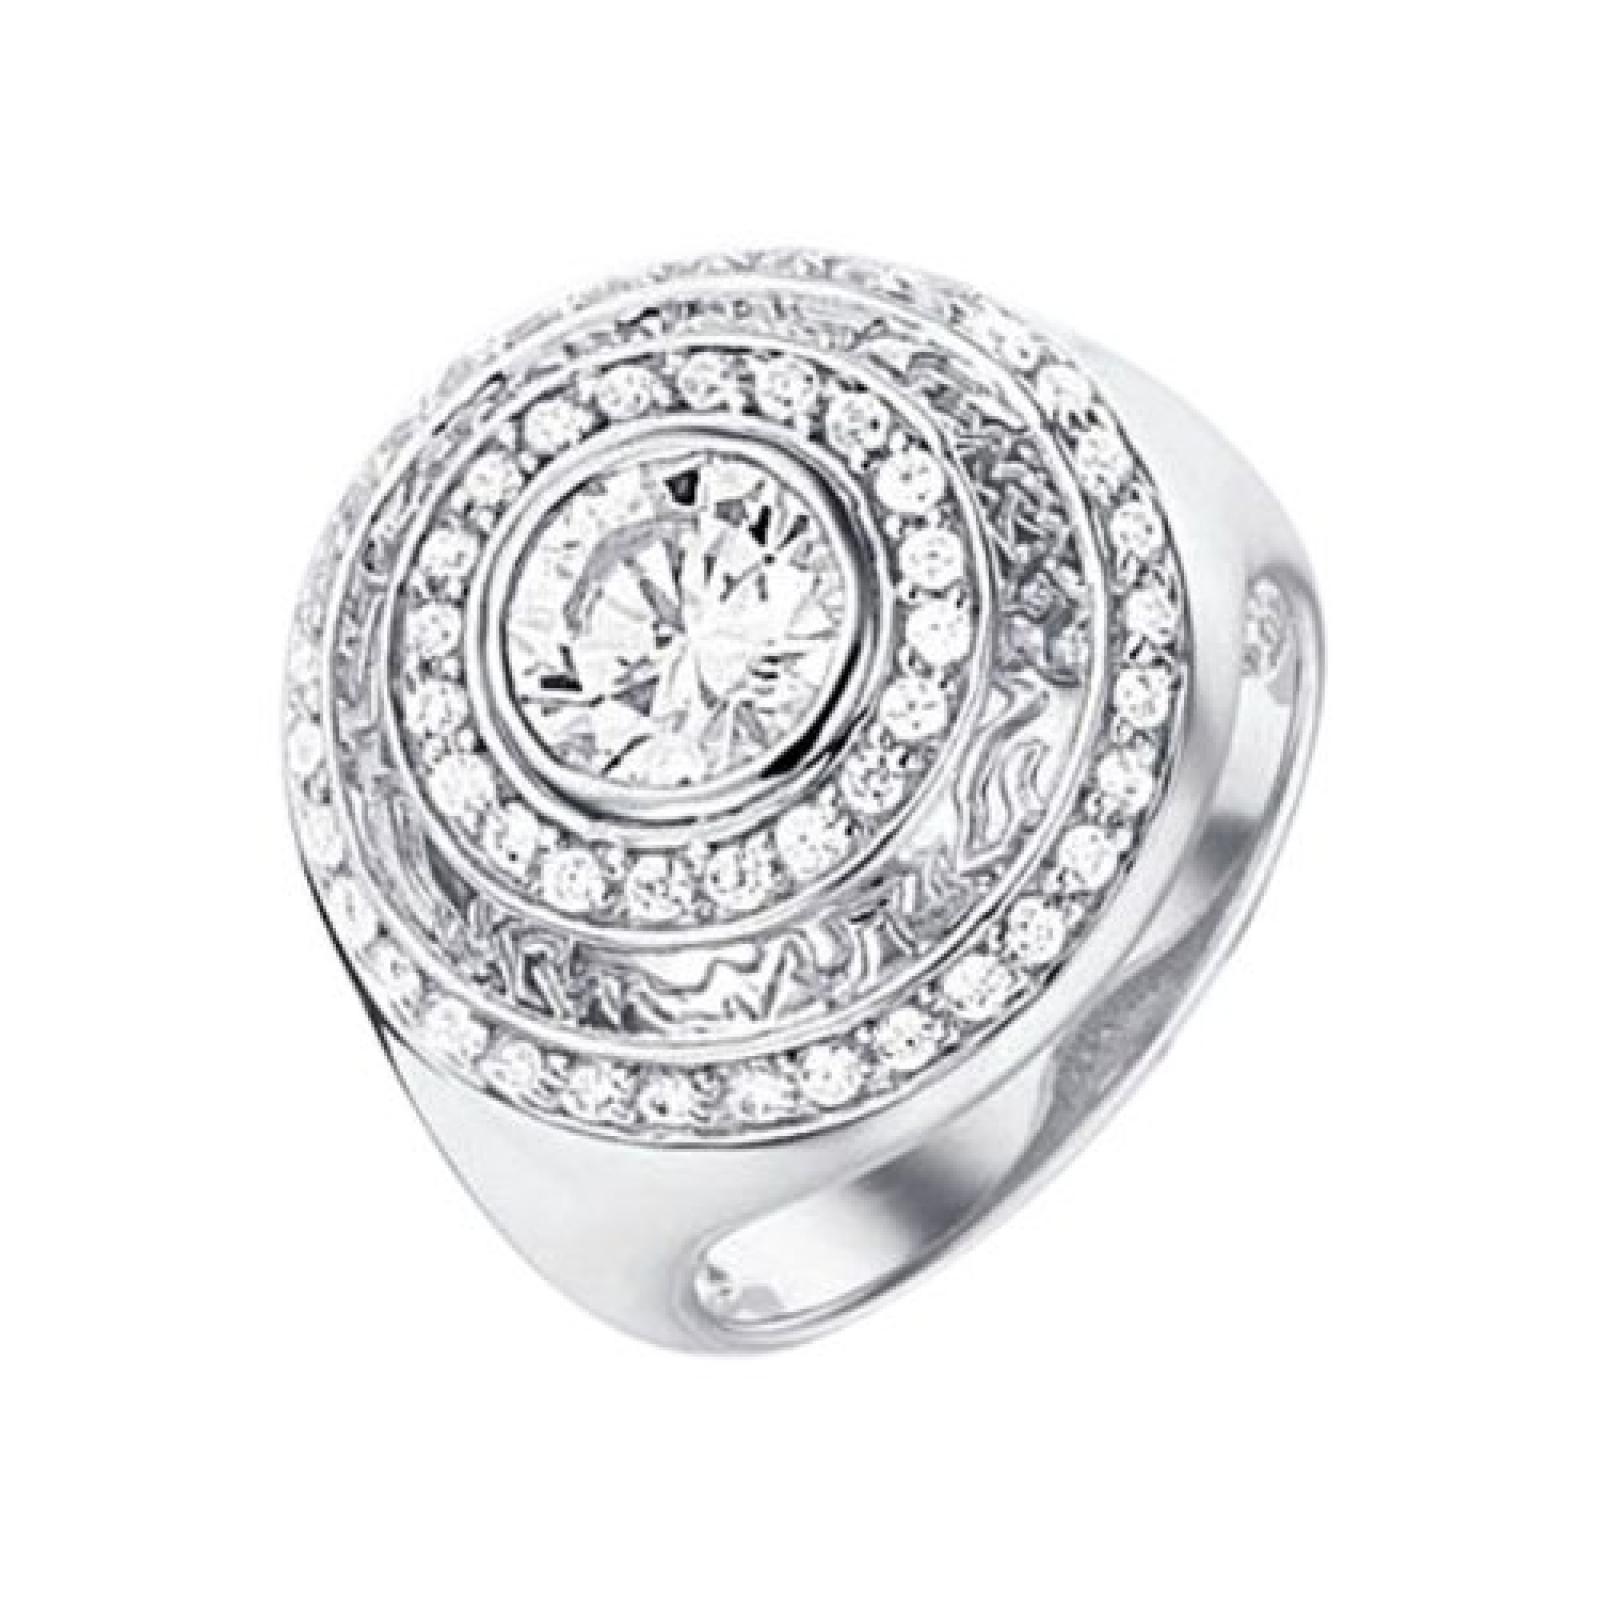 Celesta Damen-Ring 925 Sterling Silber Zirkonia weiß Gr. 60 (19.1) 360271520L-019